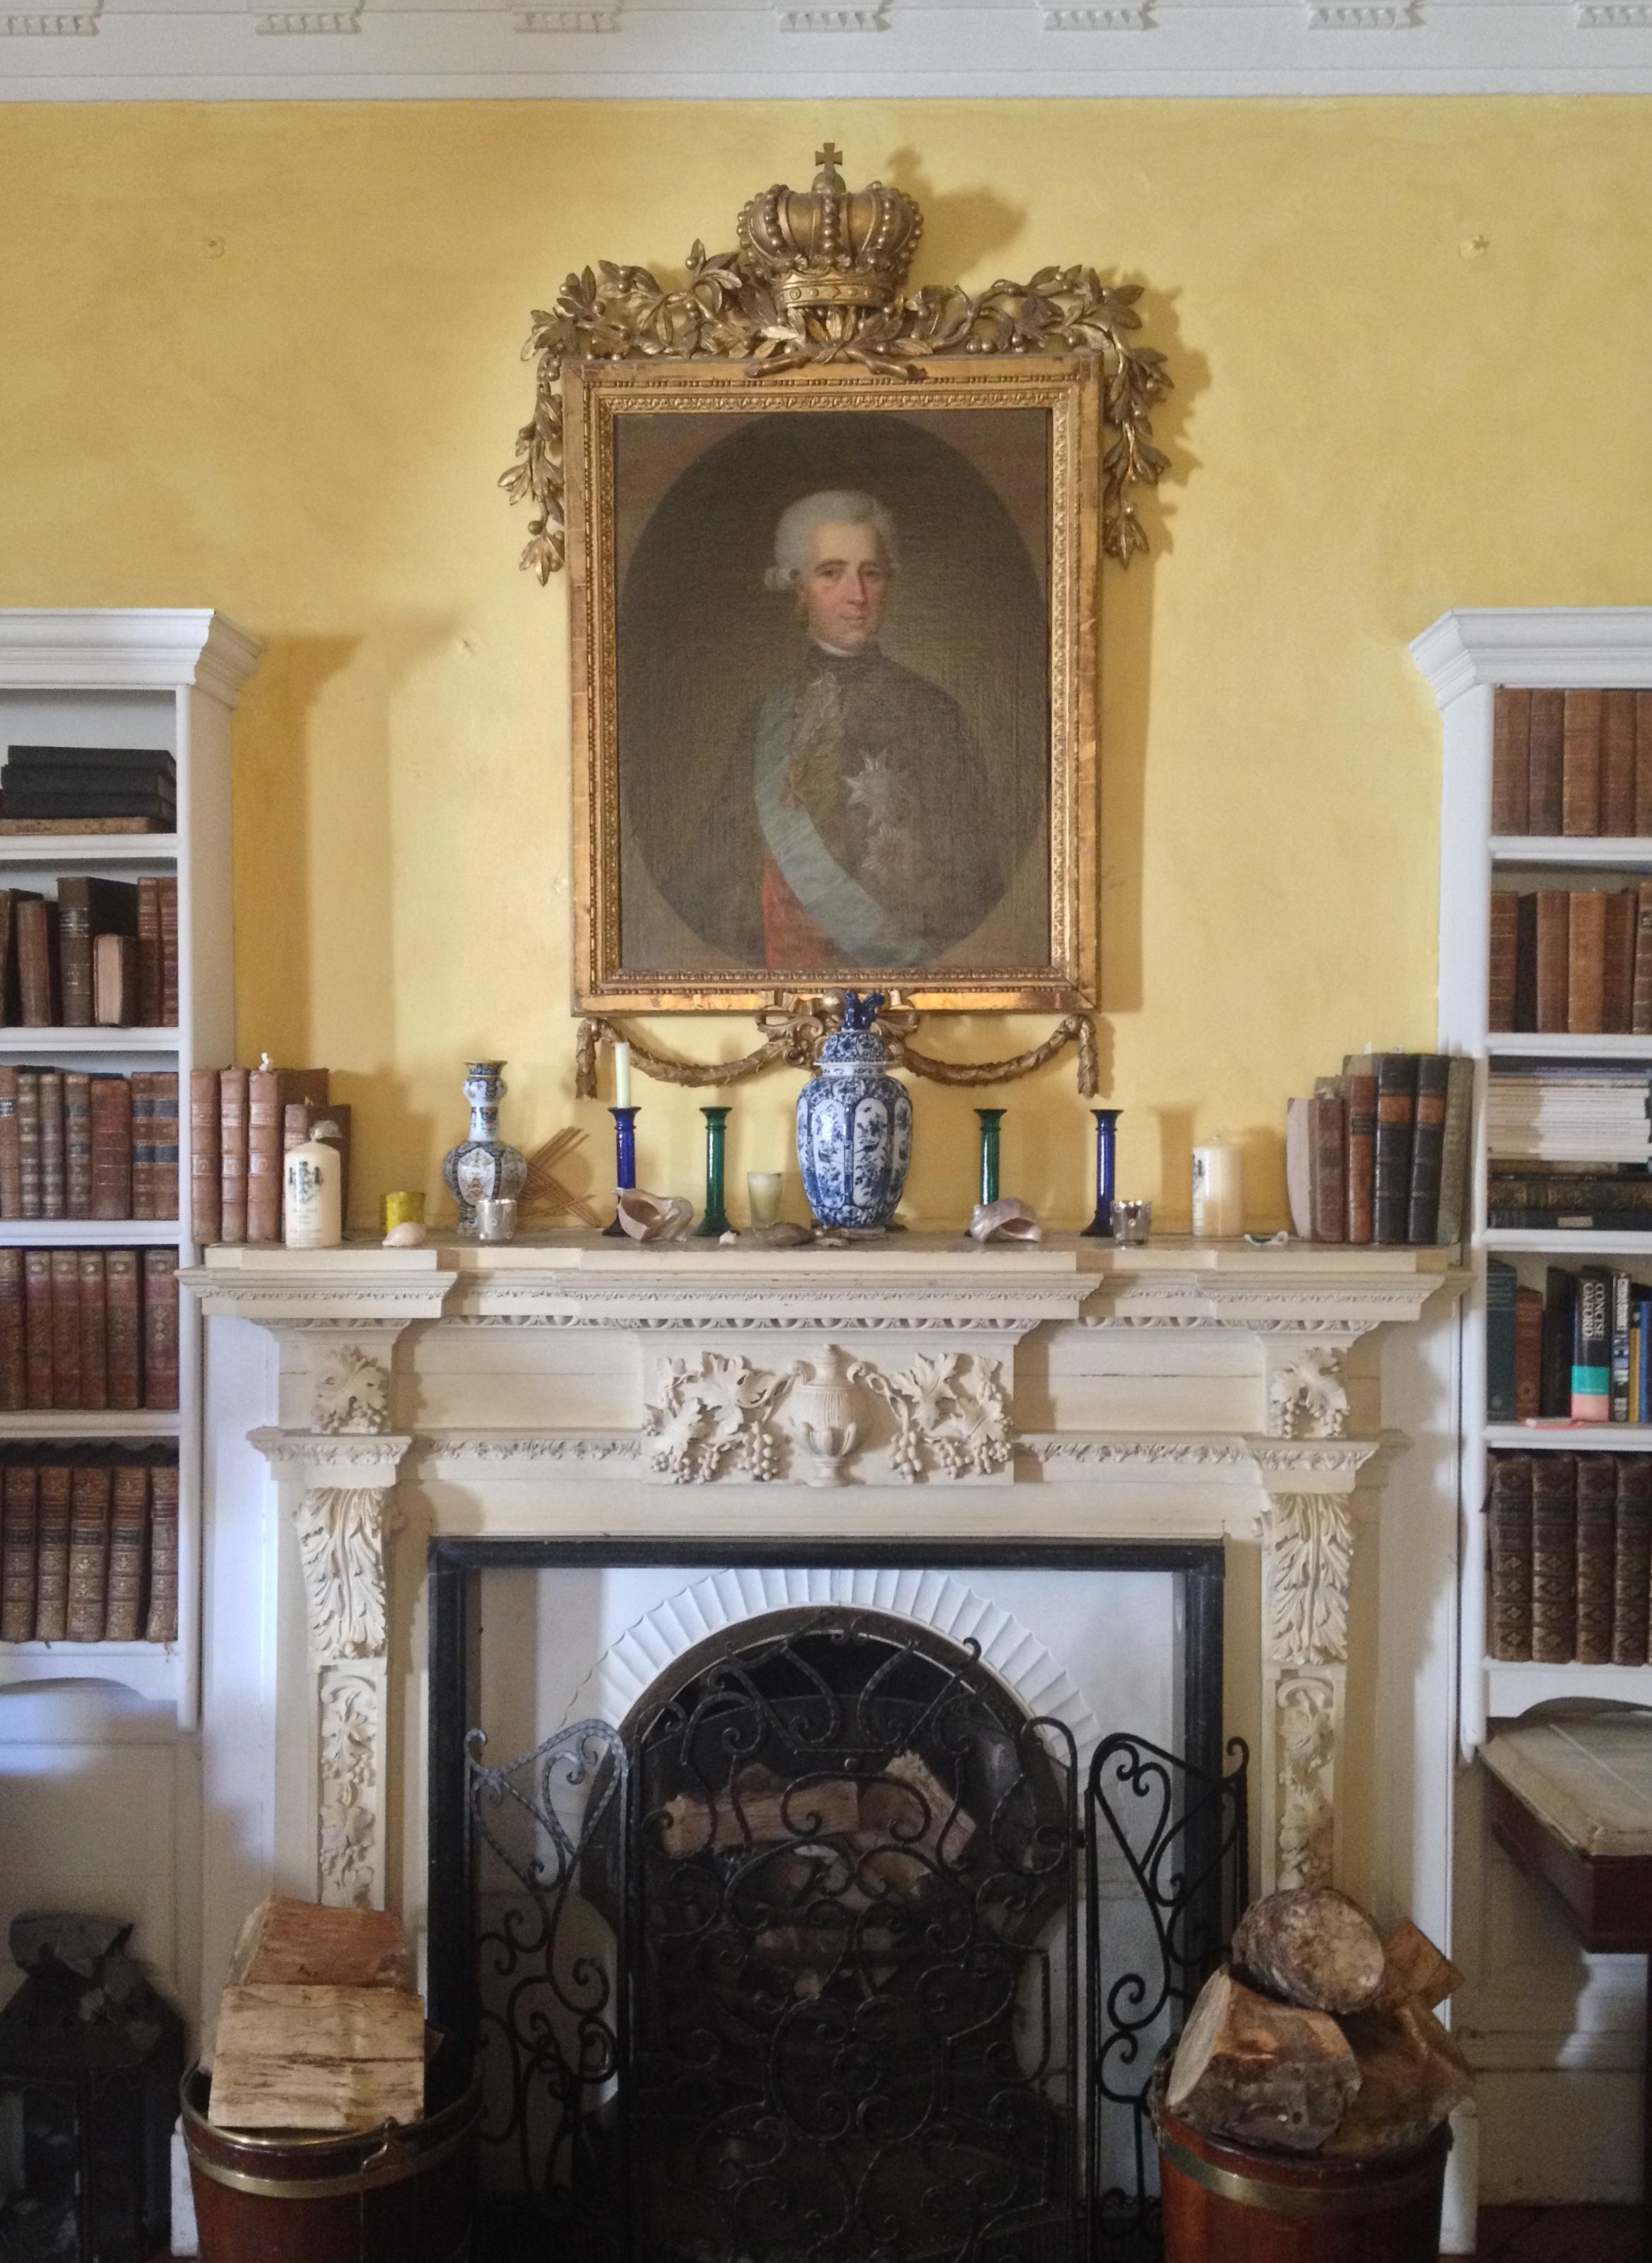 Hamptons glamour in Ardmore for 395,000 - Irish Examiner